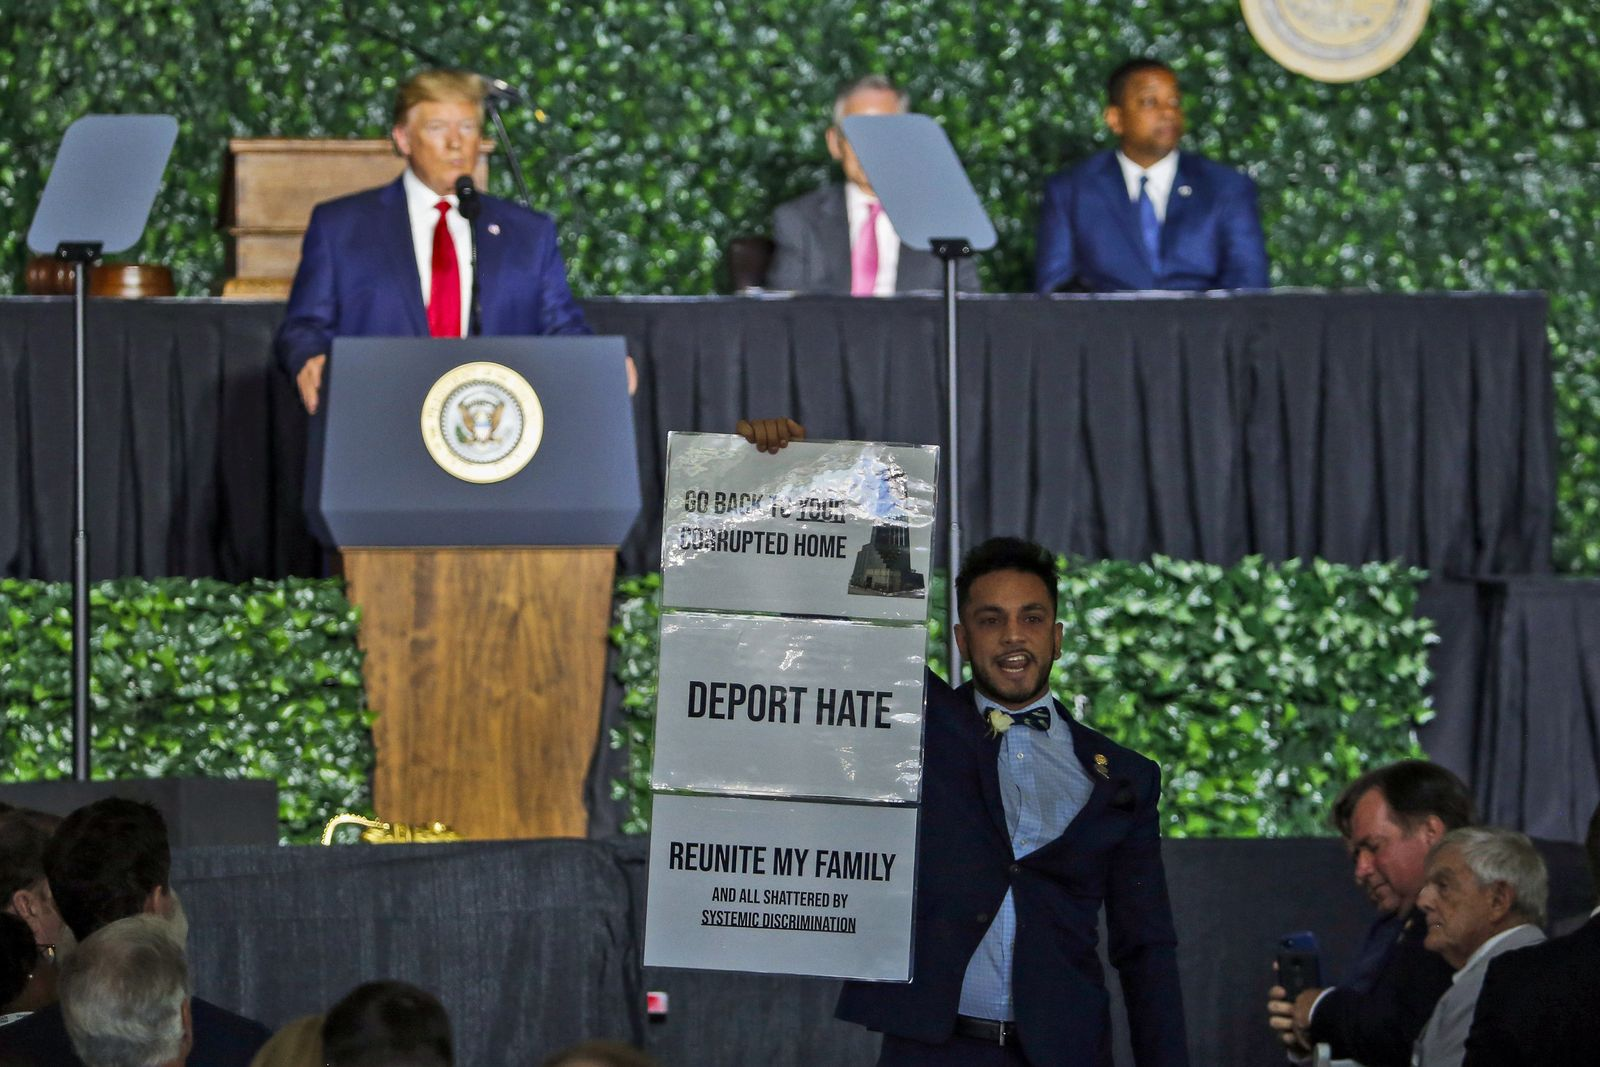 Trump-Rede unterbrochen